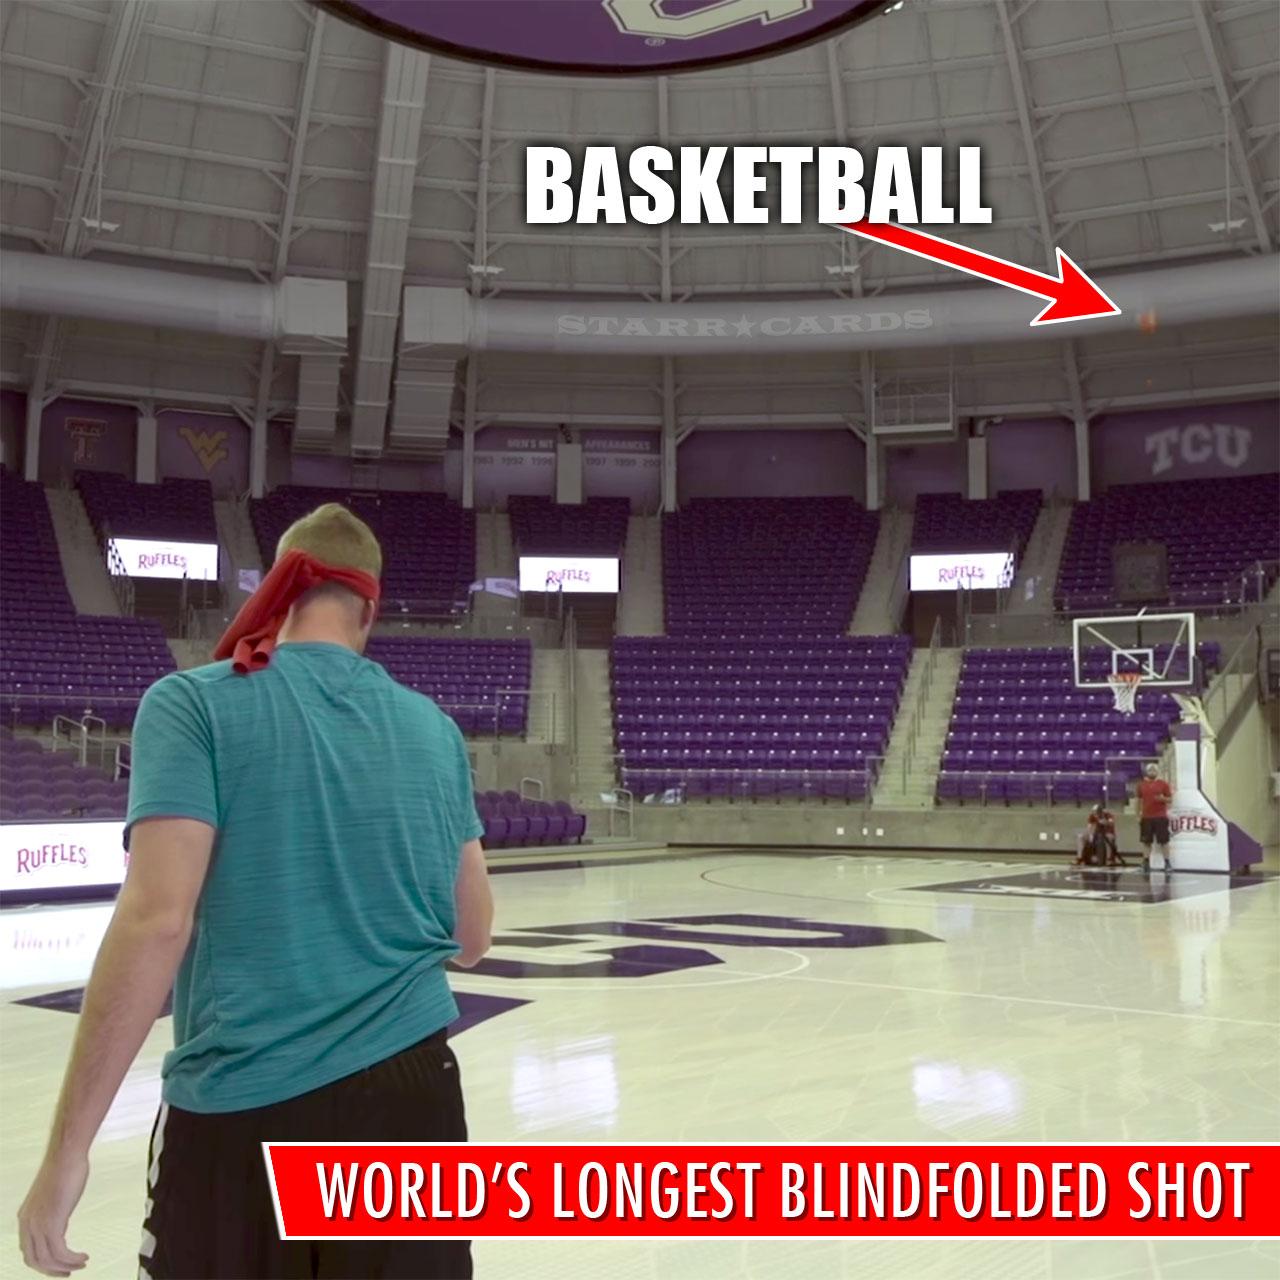 Dude Perfect Guinness World Record: Longest blindfolded basketball shot